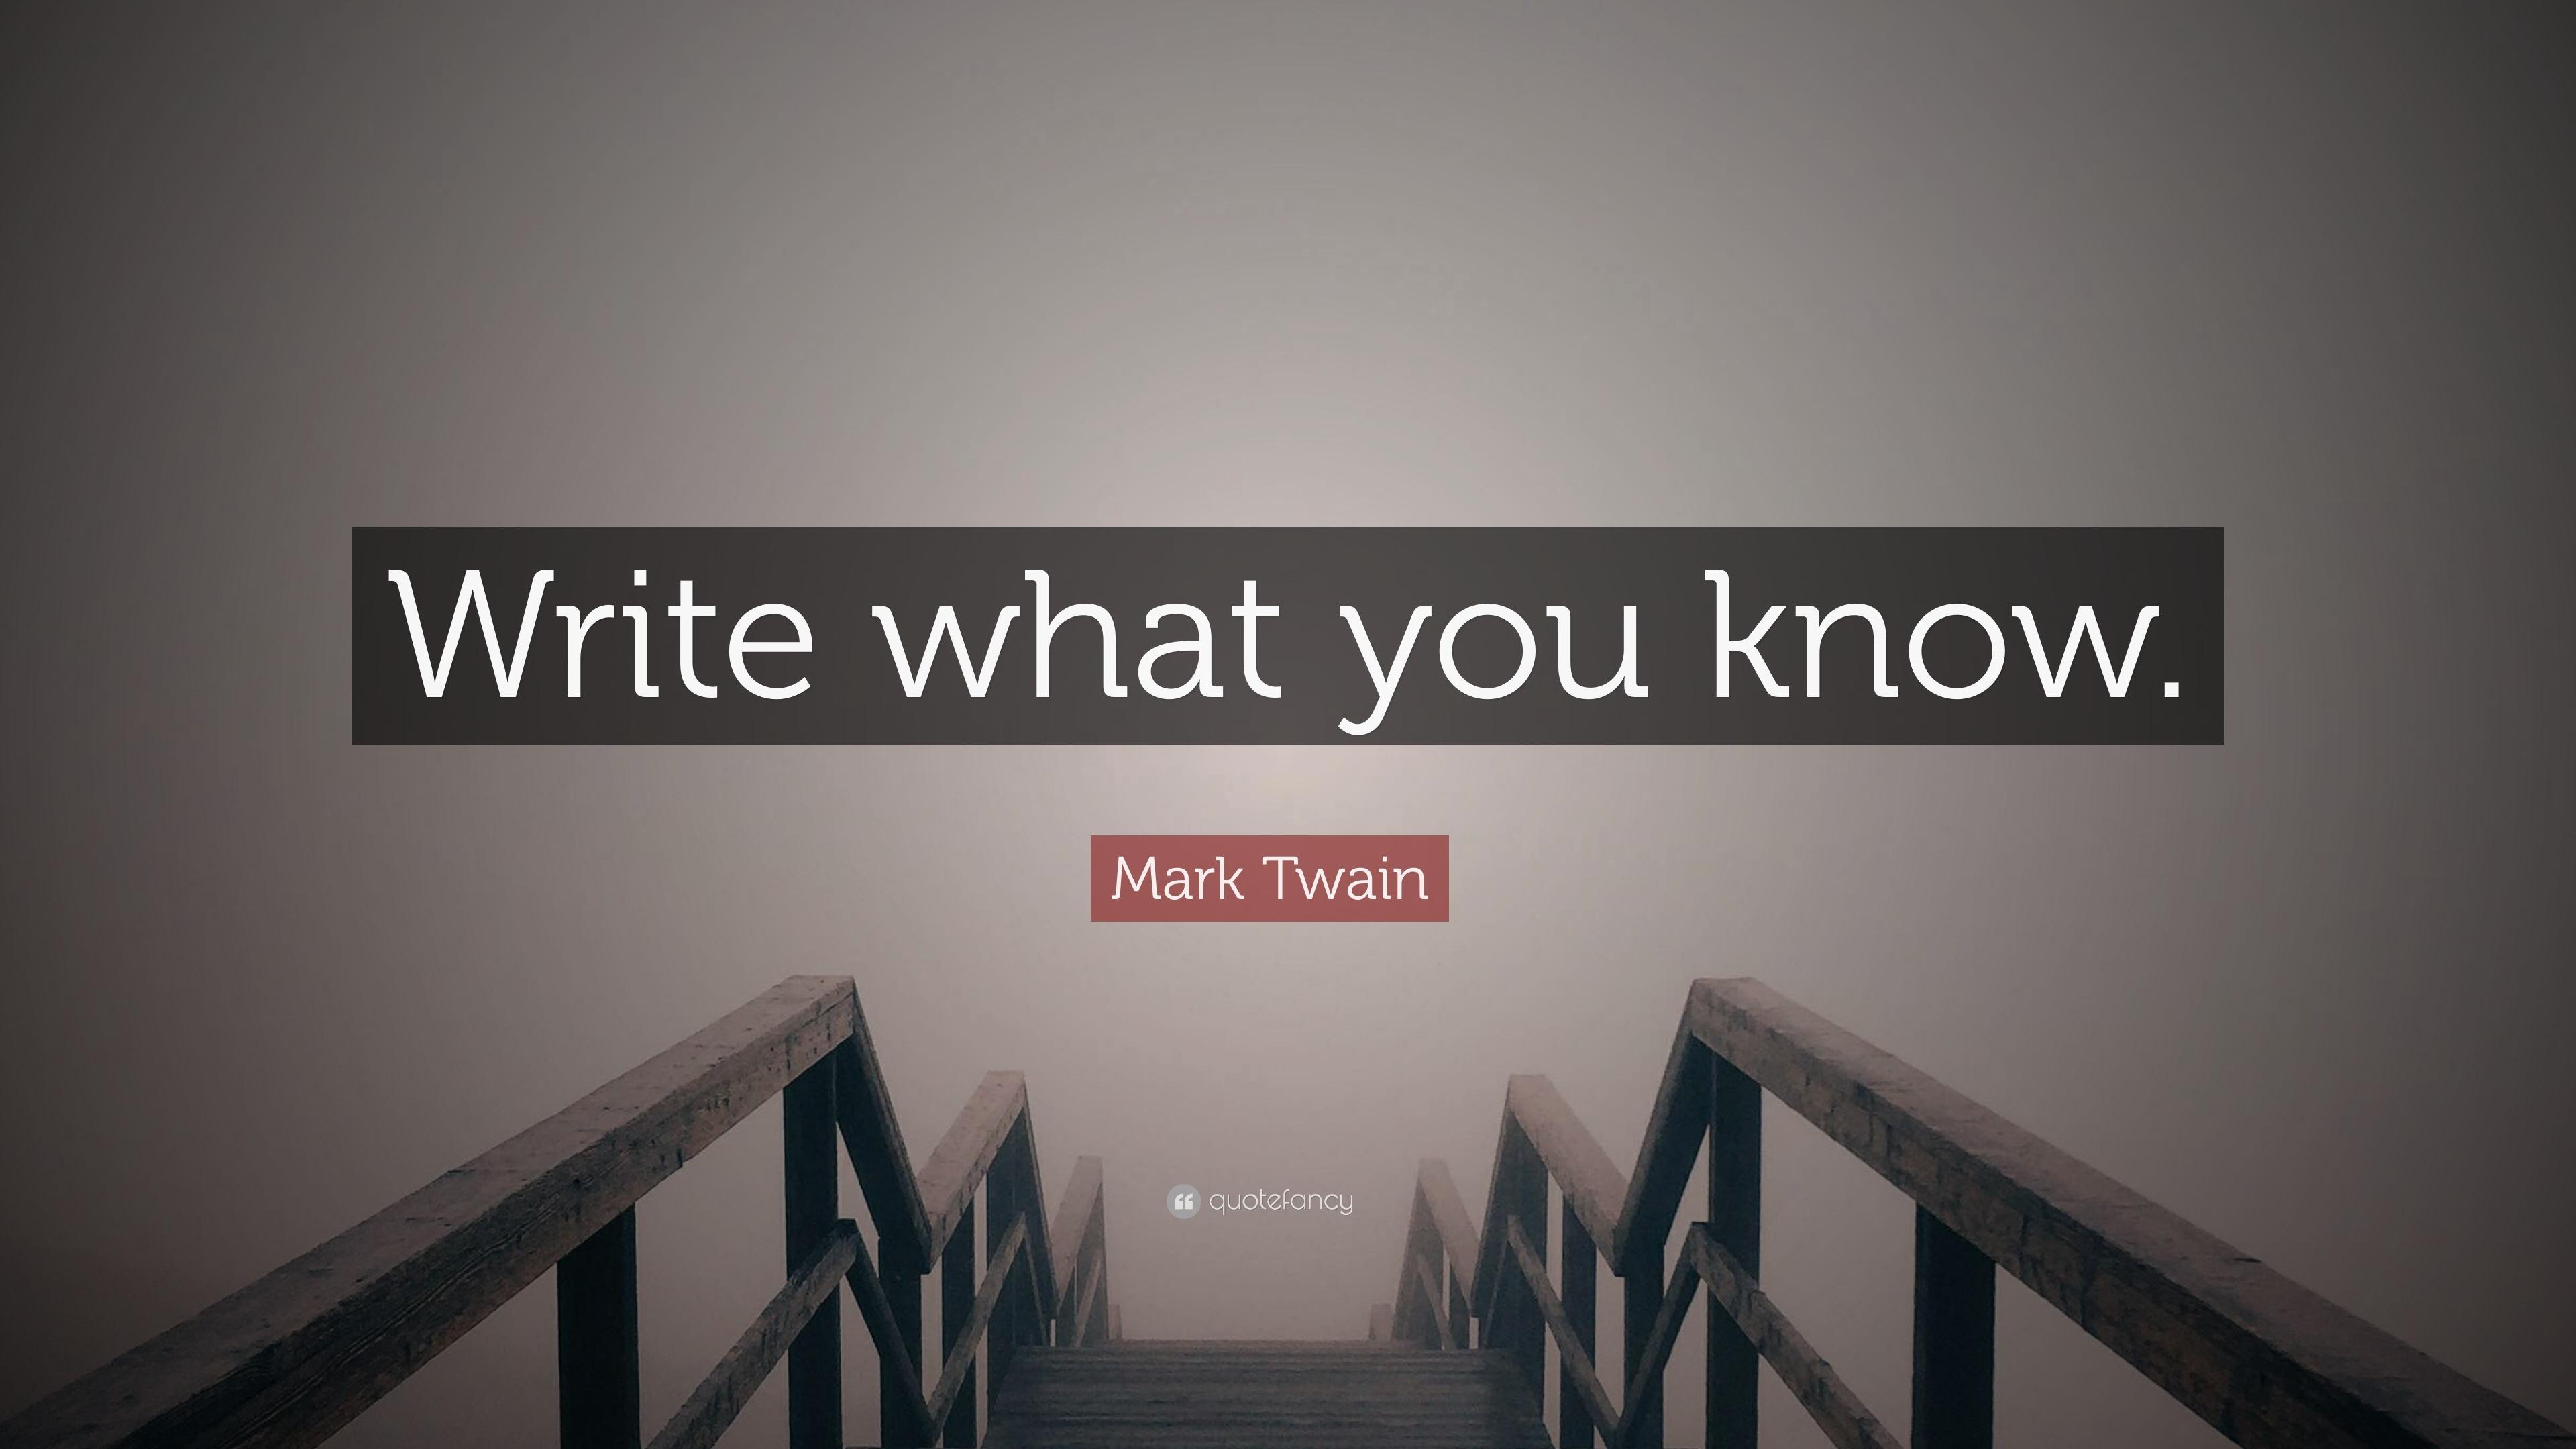 how to write a mark twain story